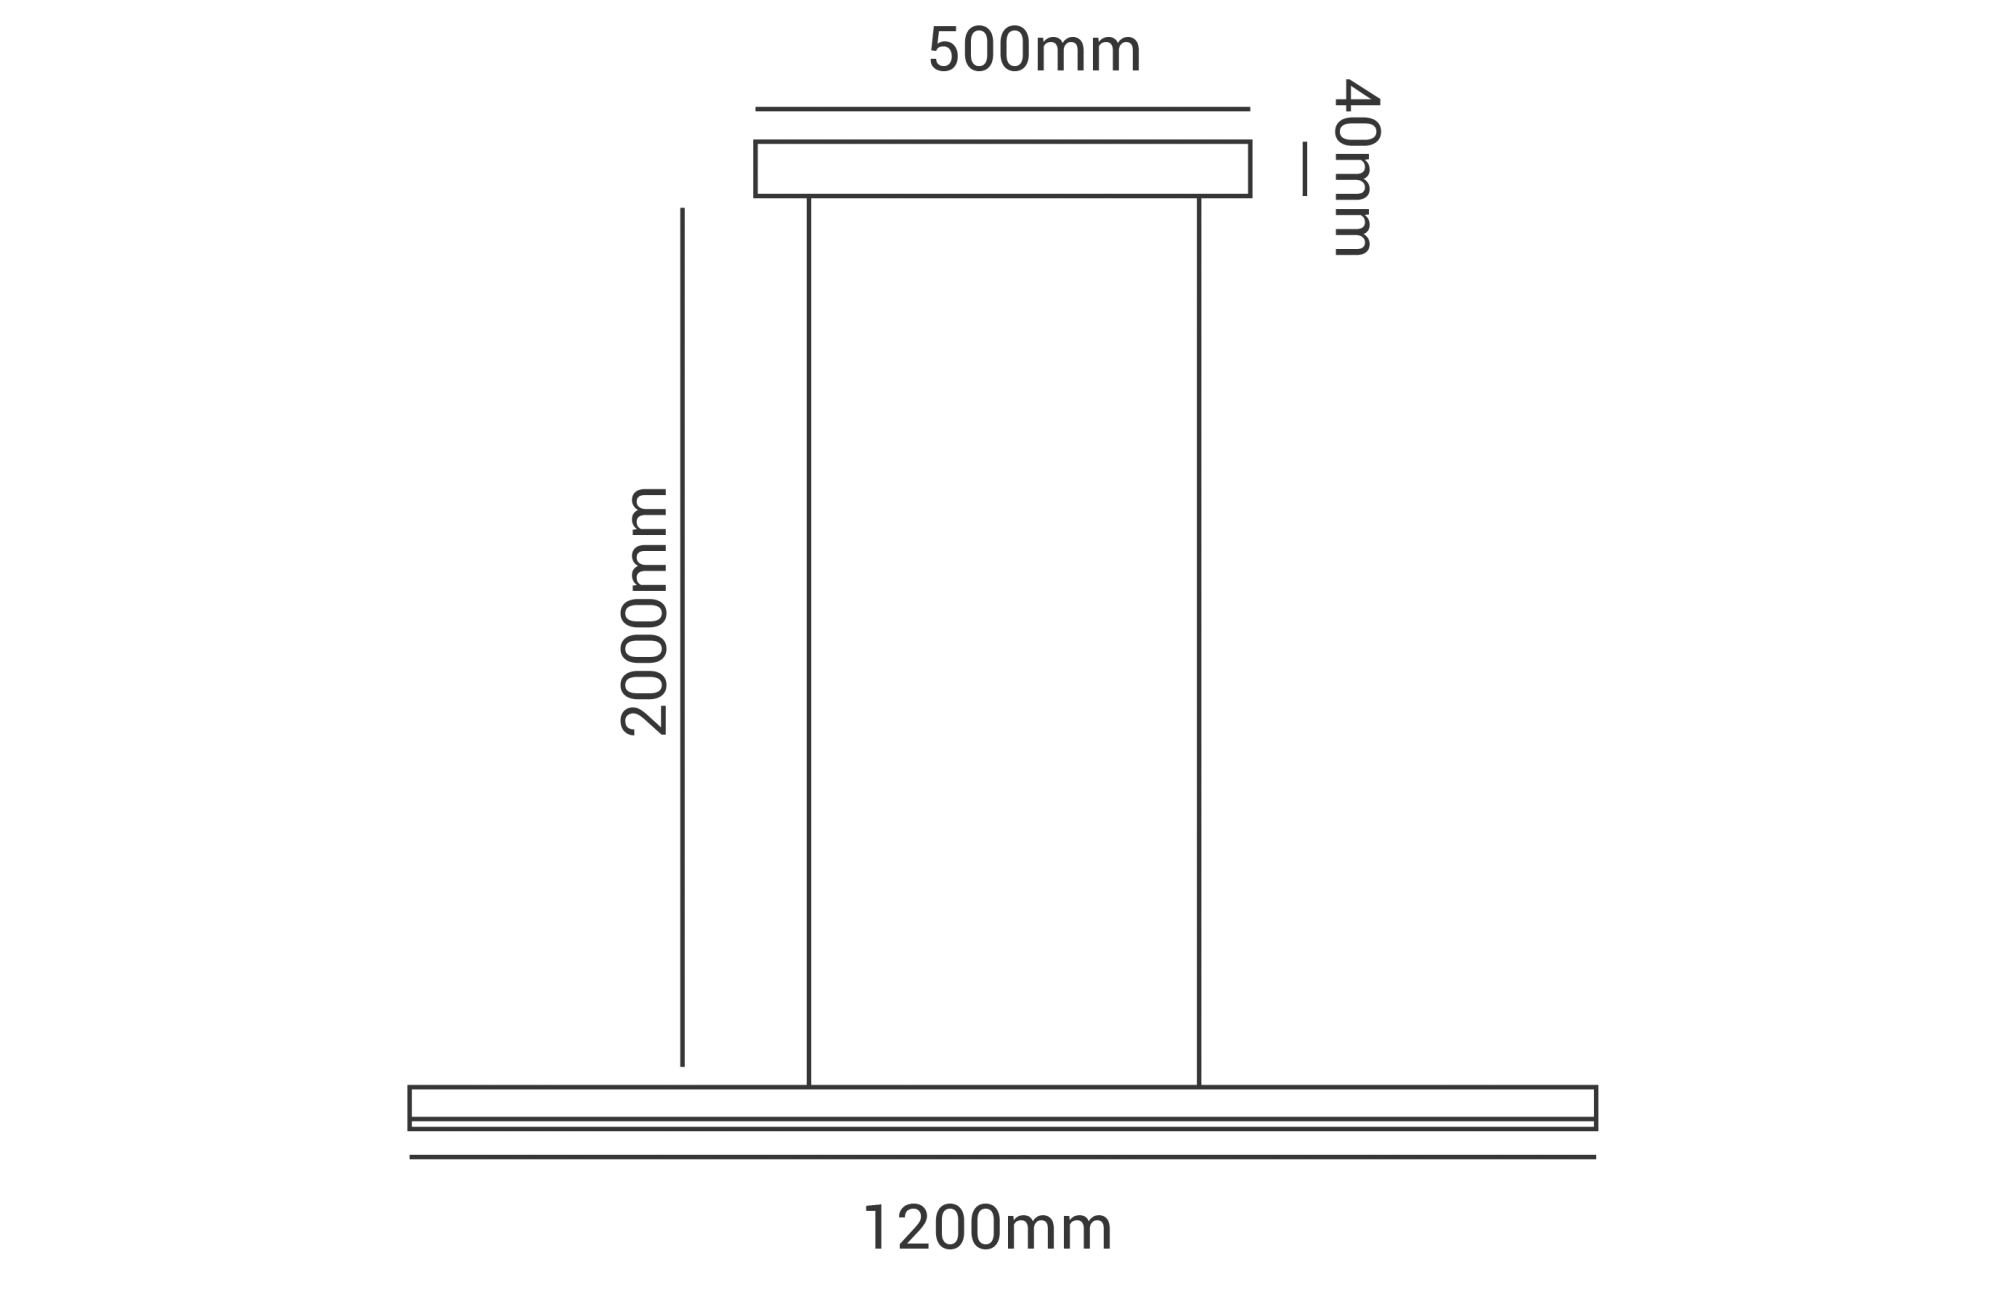 Pendente LED Opus DN35819 Zion 41W 4000K IP20 Bivolt Ø1200x500x2000mm Preto